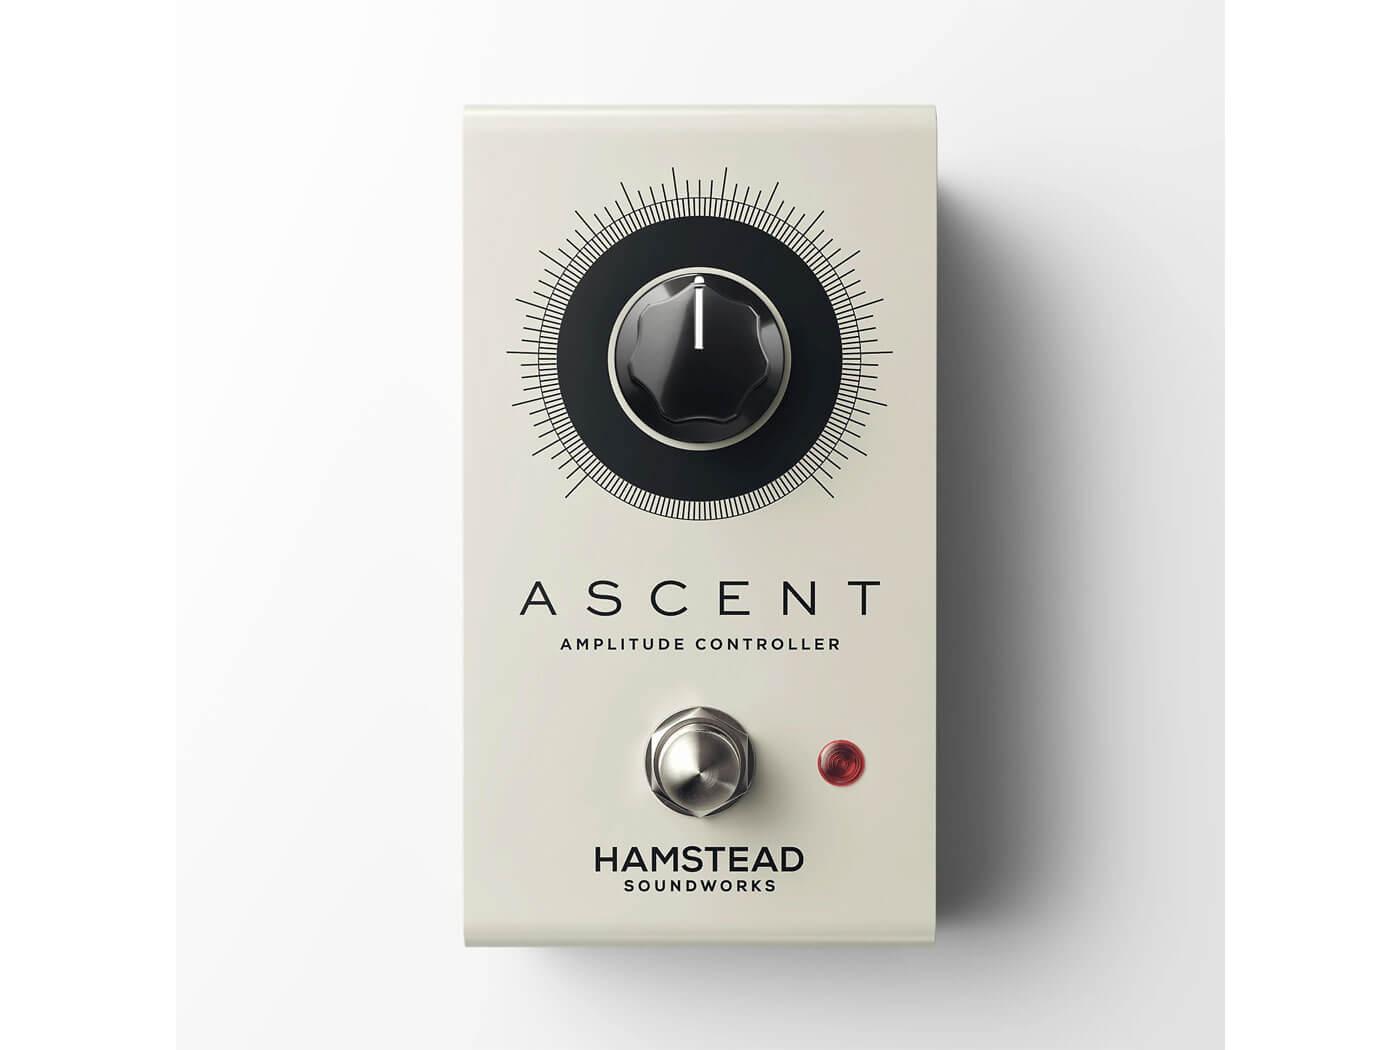 Hamstead Soundwords ascent